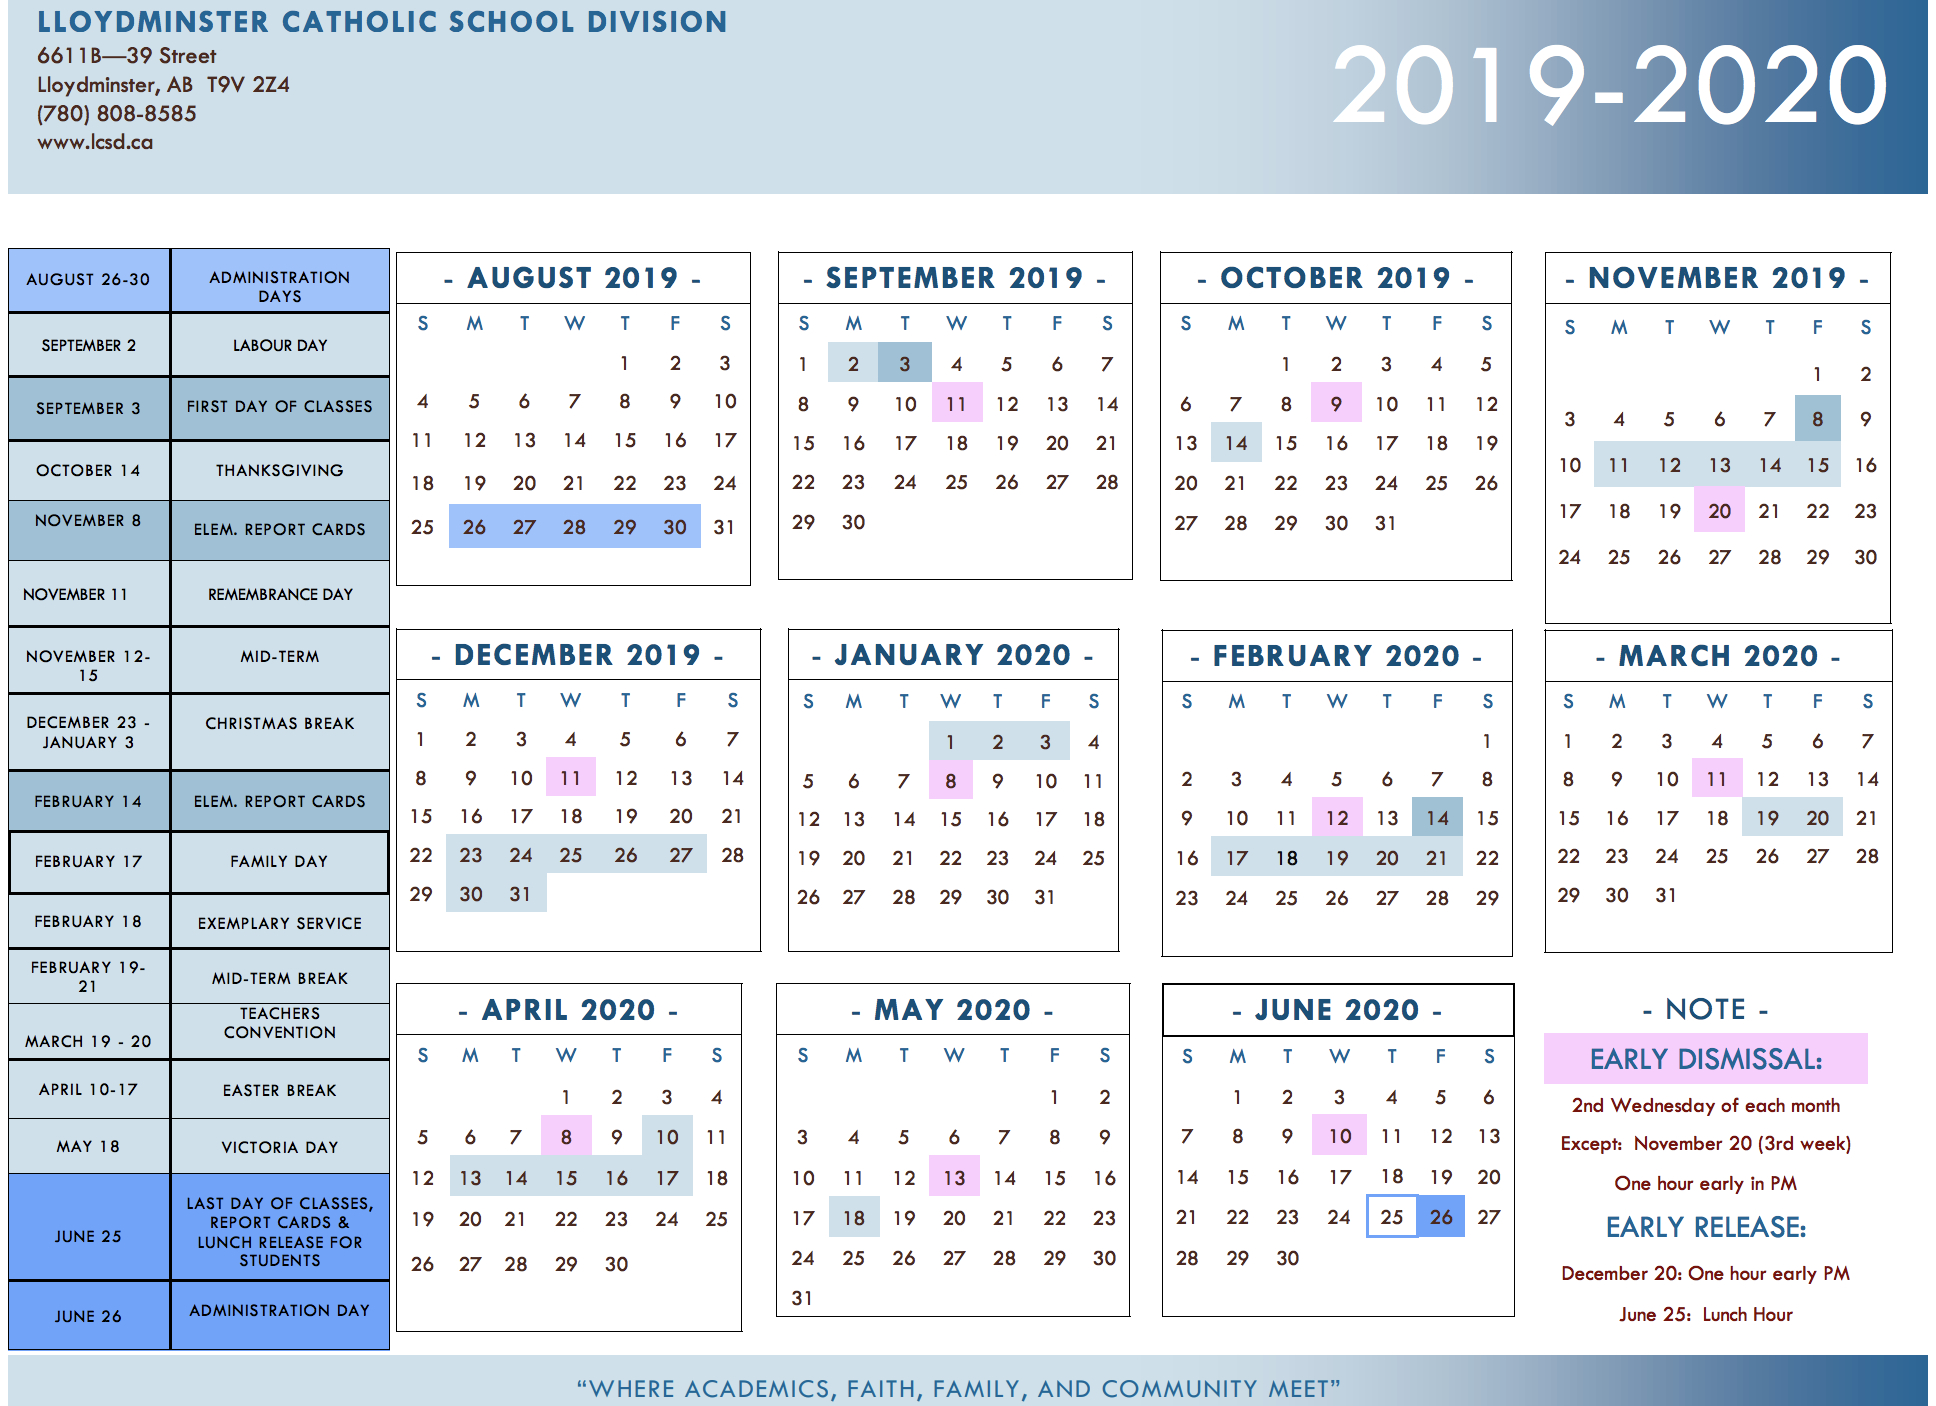 Division Calendar - Lloydminster Catholic School Division